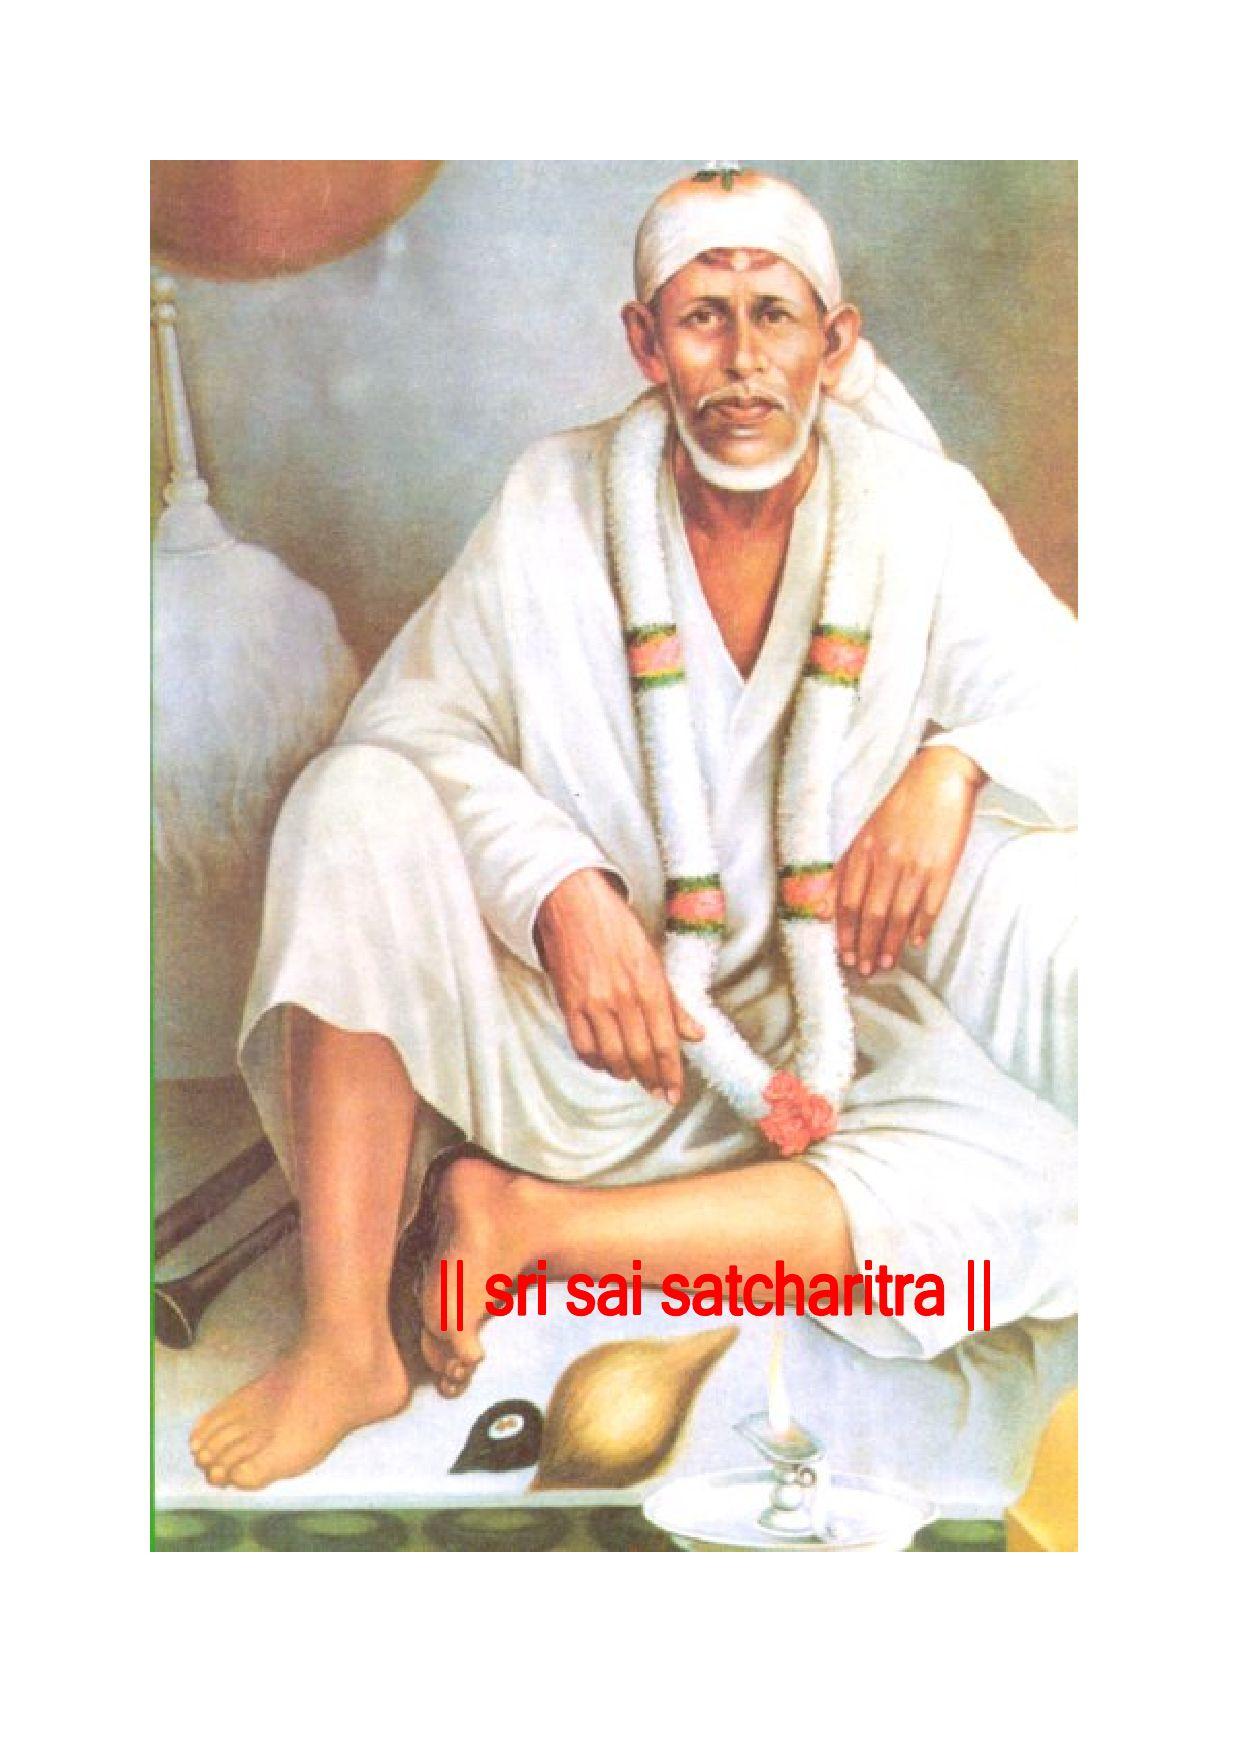 Shirdhi Sai Baba Sat Charitra by Sapad sapvice - issuu